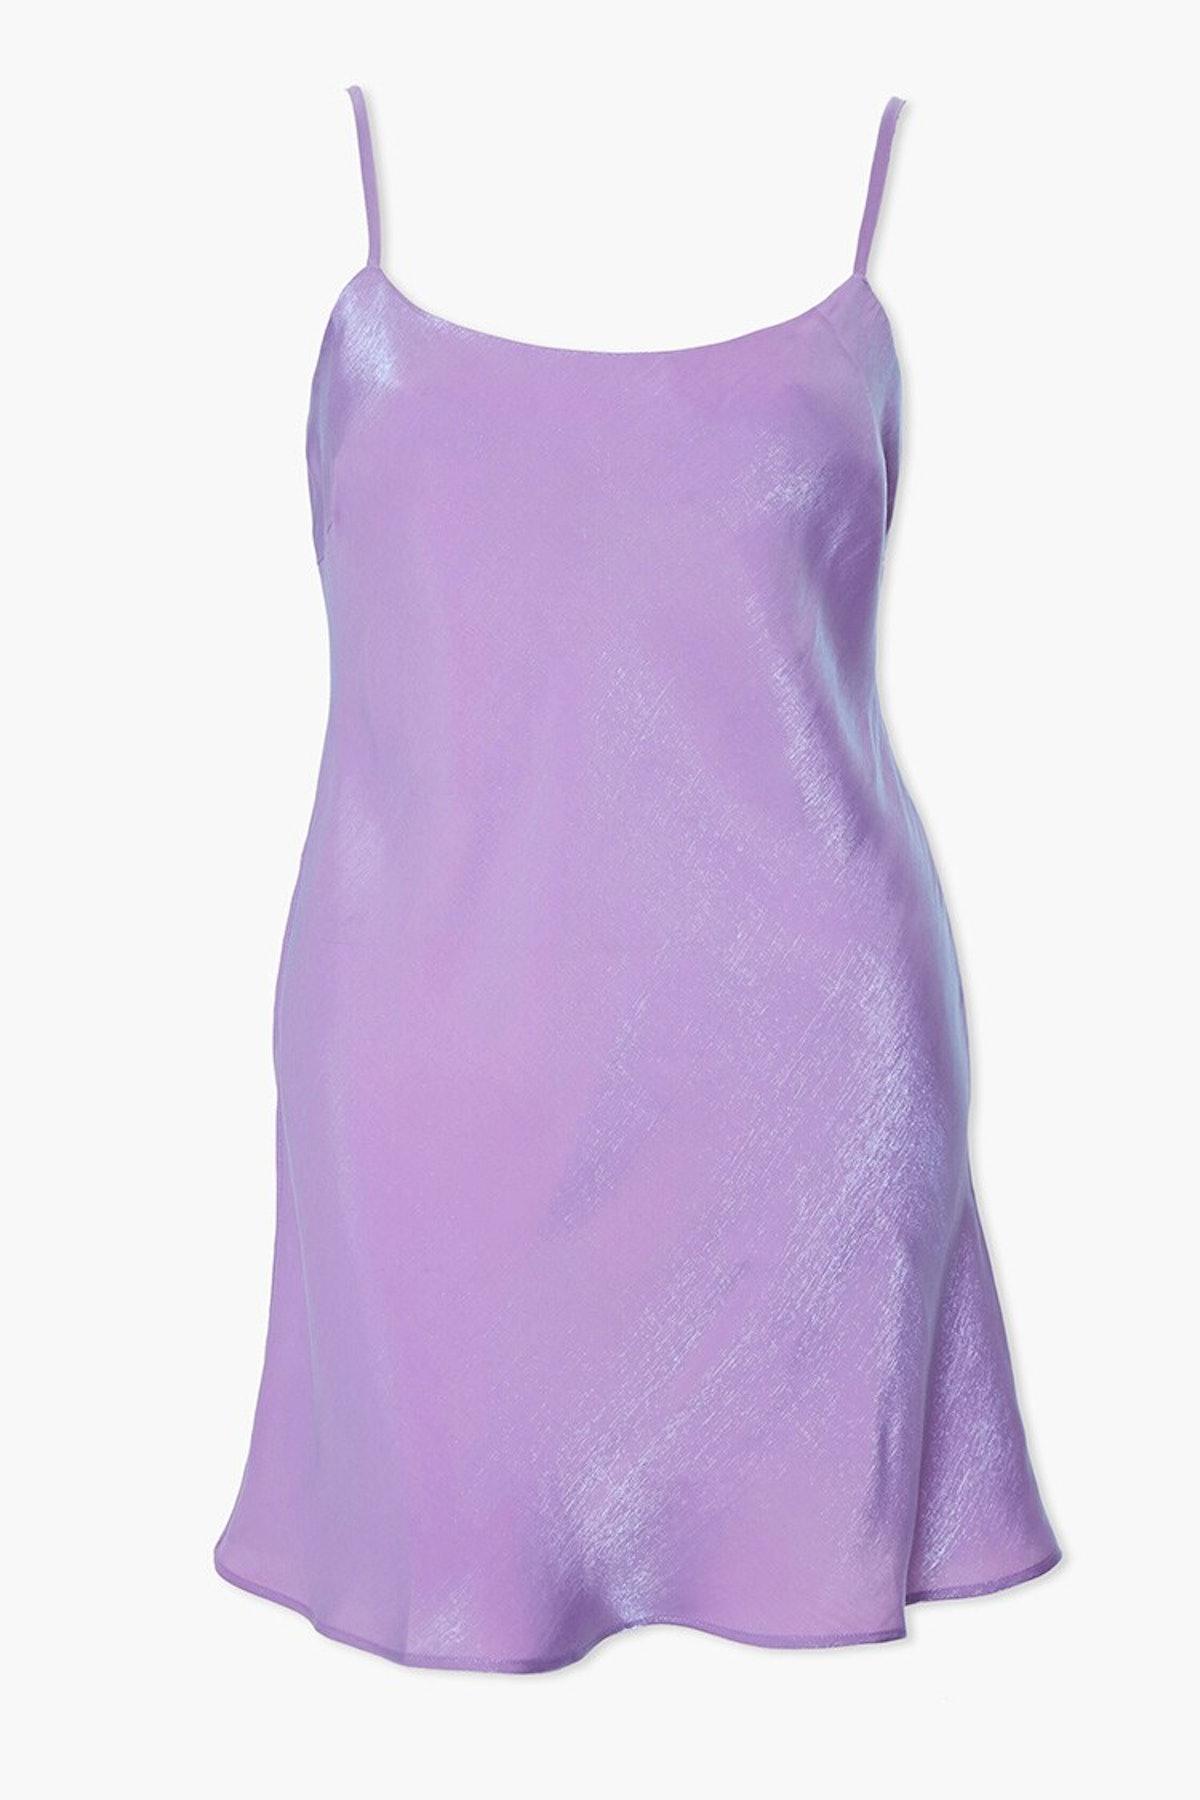 Forever 21 Plus Size Satin Cami Dress